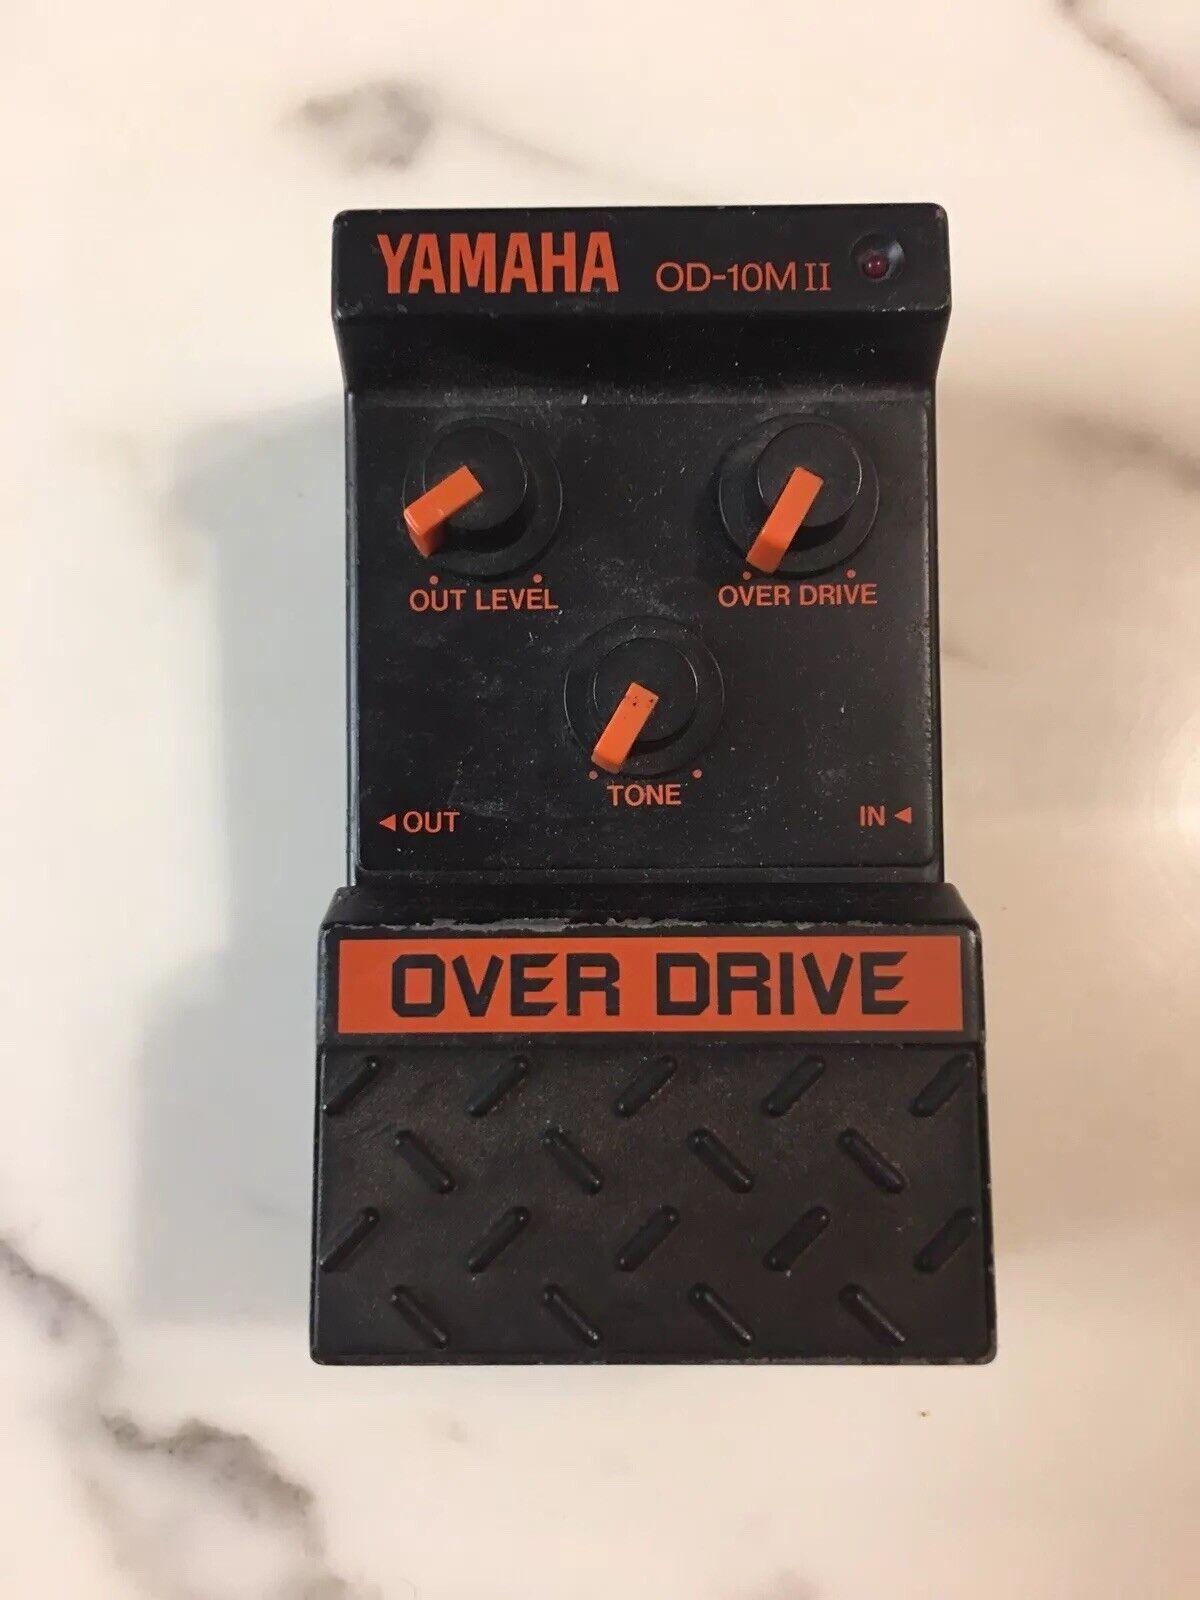 Yamaha Od-10mii Analog Overdrive Rare Vintage Gitarren Effekt Pedal Mij Japan